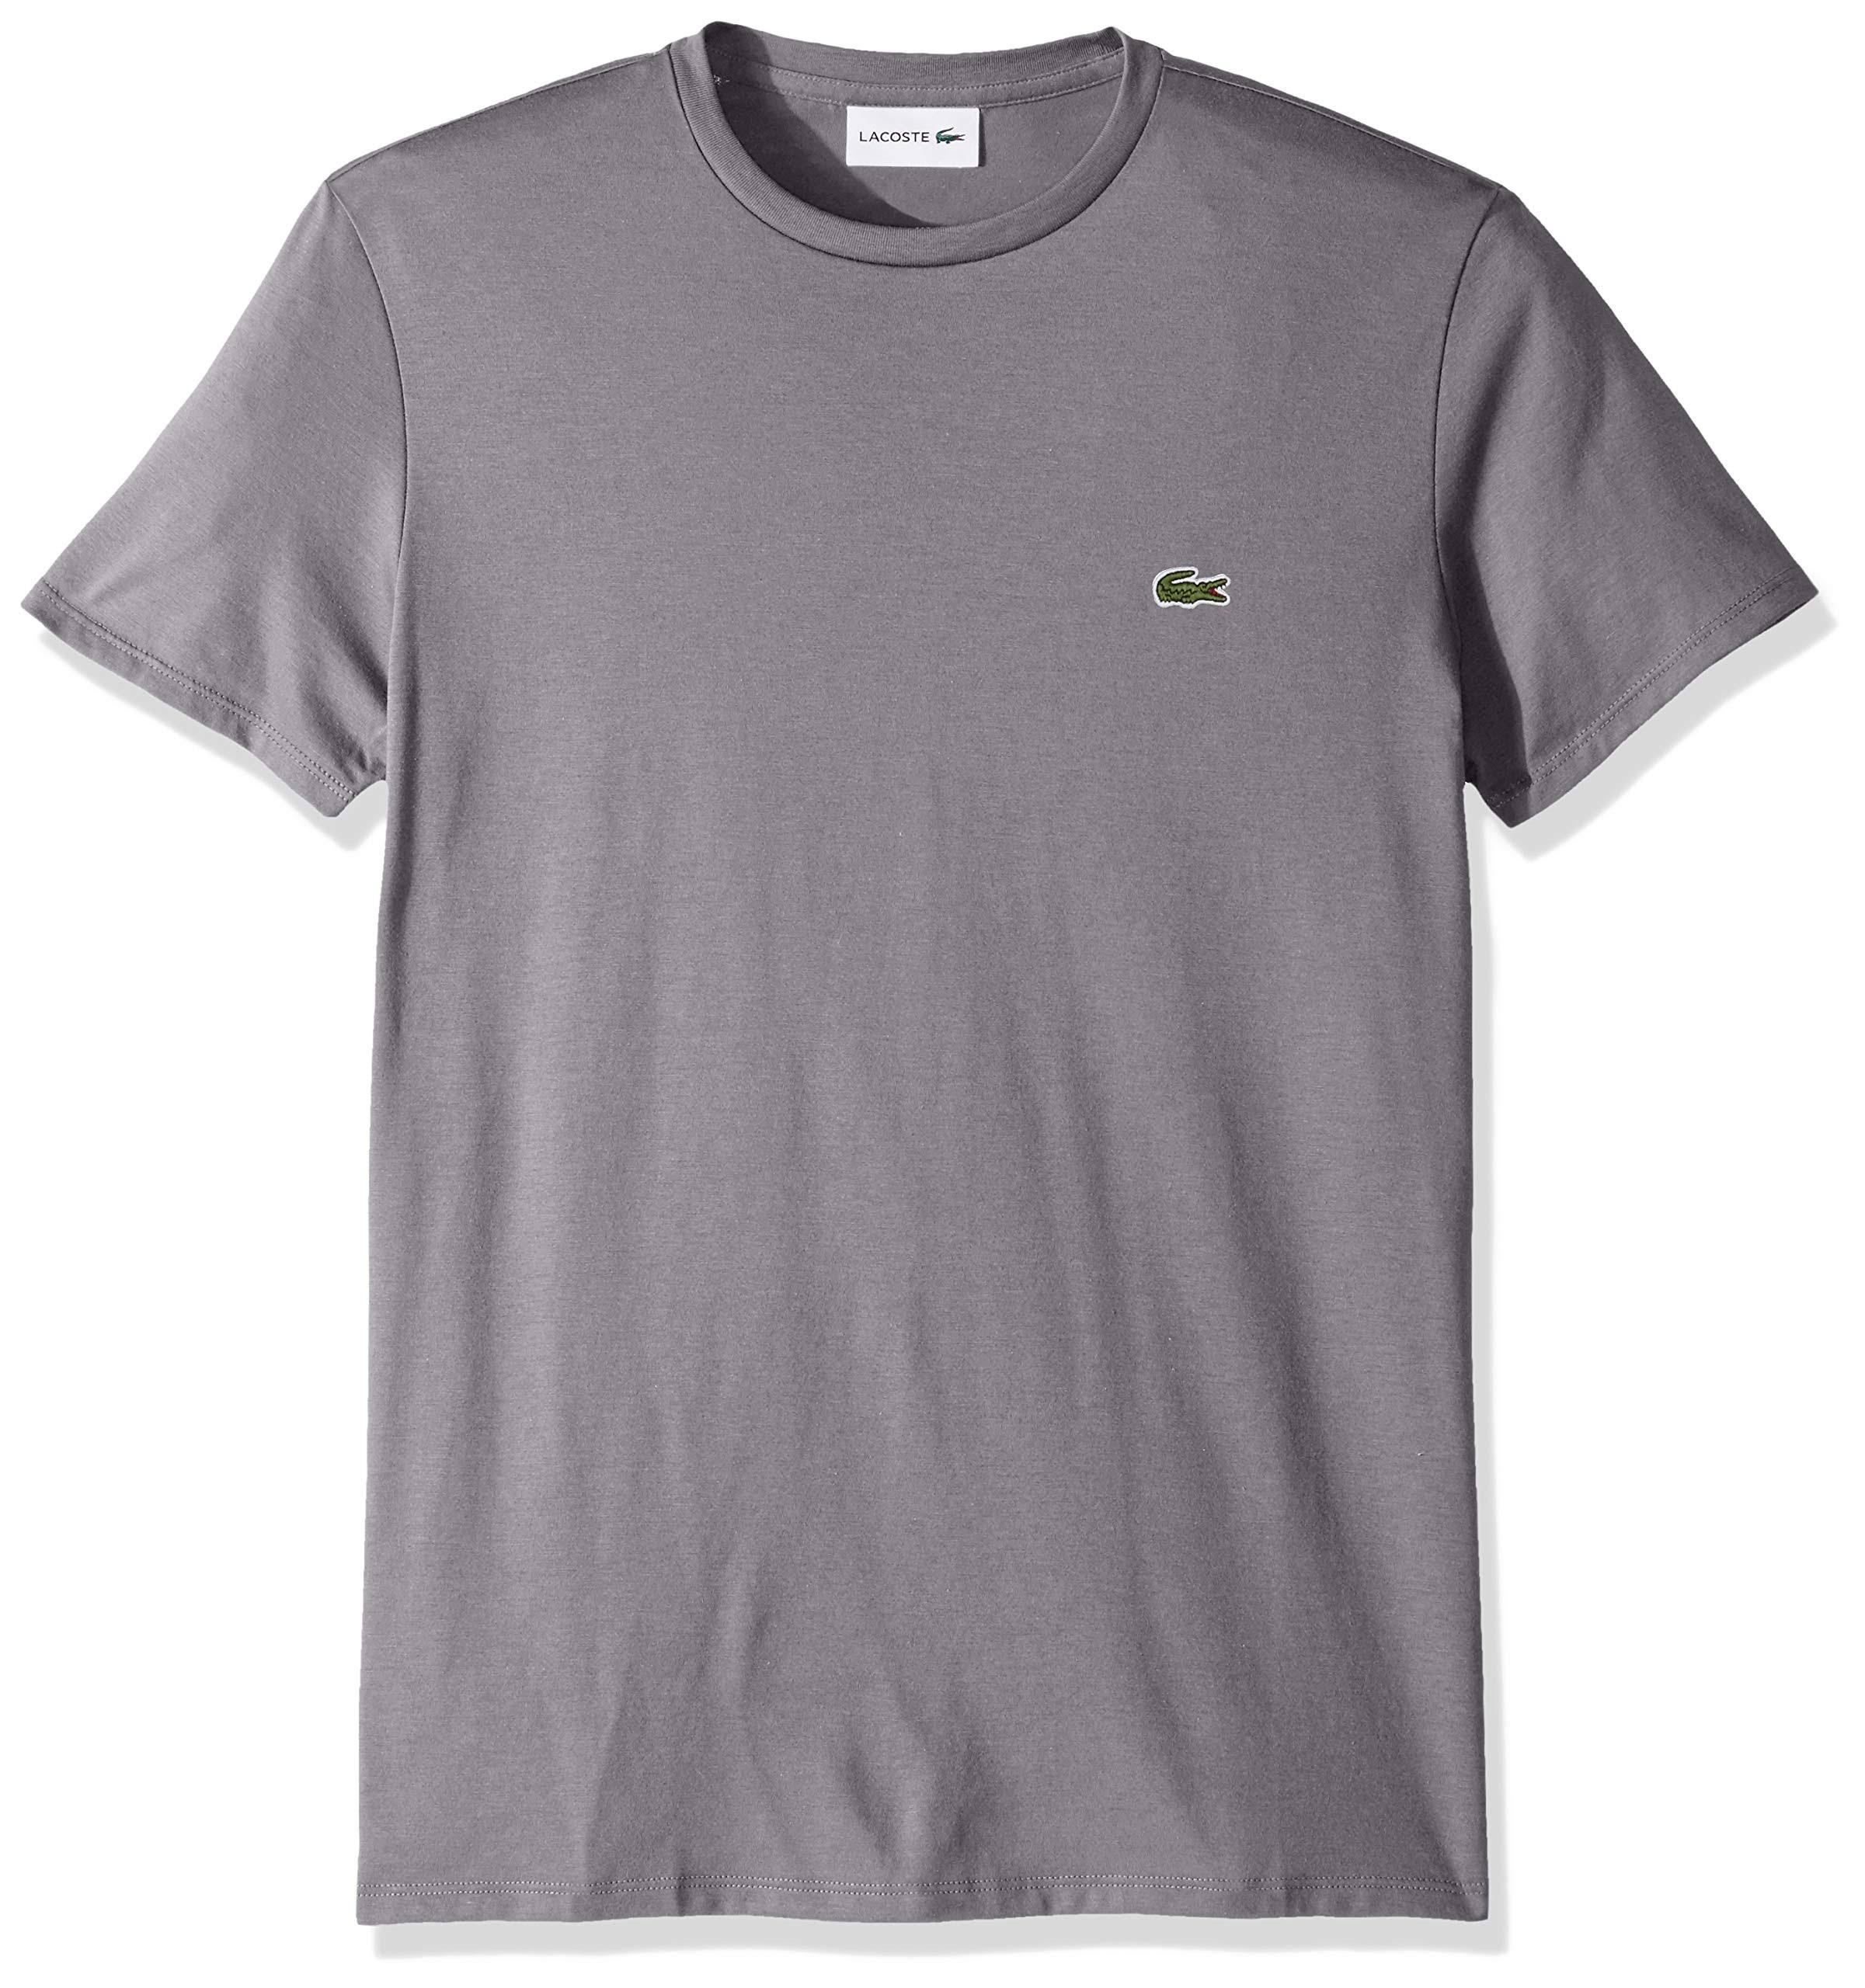 Pima shirt Lacoste Herren S Dunkelgrau T Crewneck HqEBq